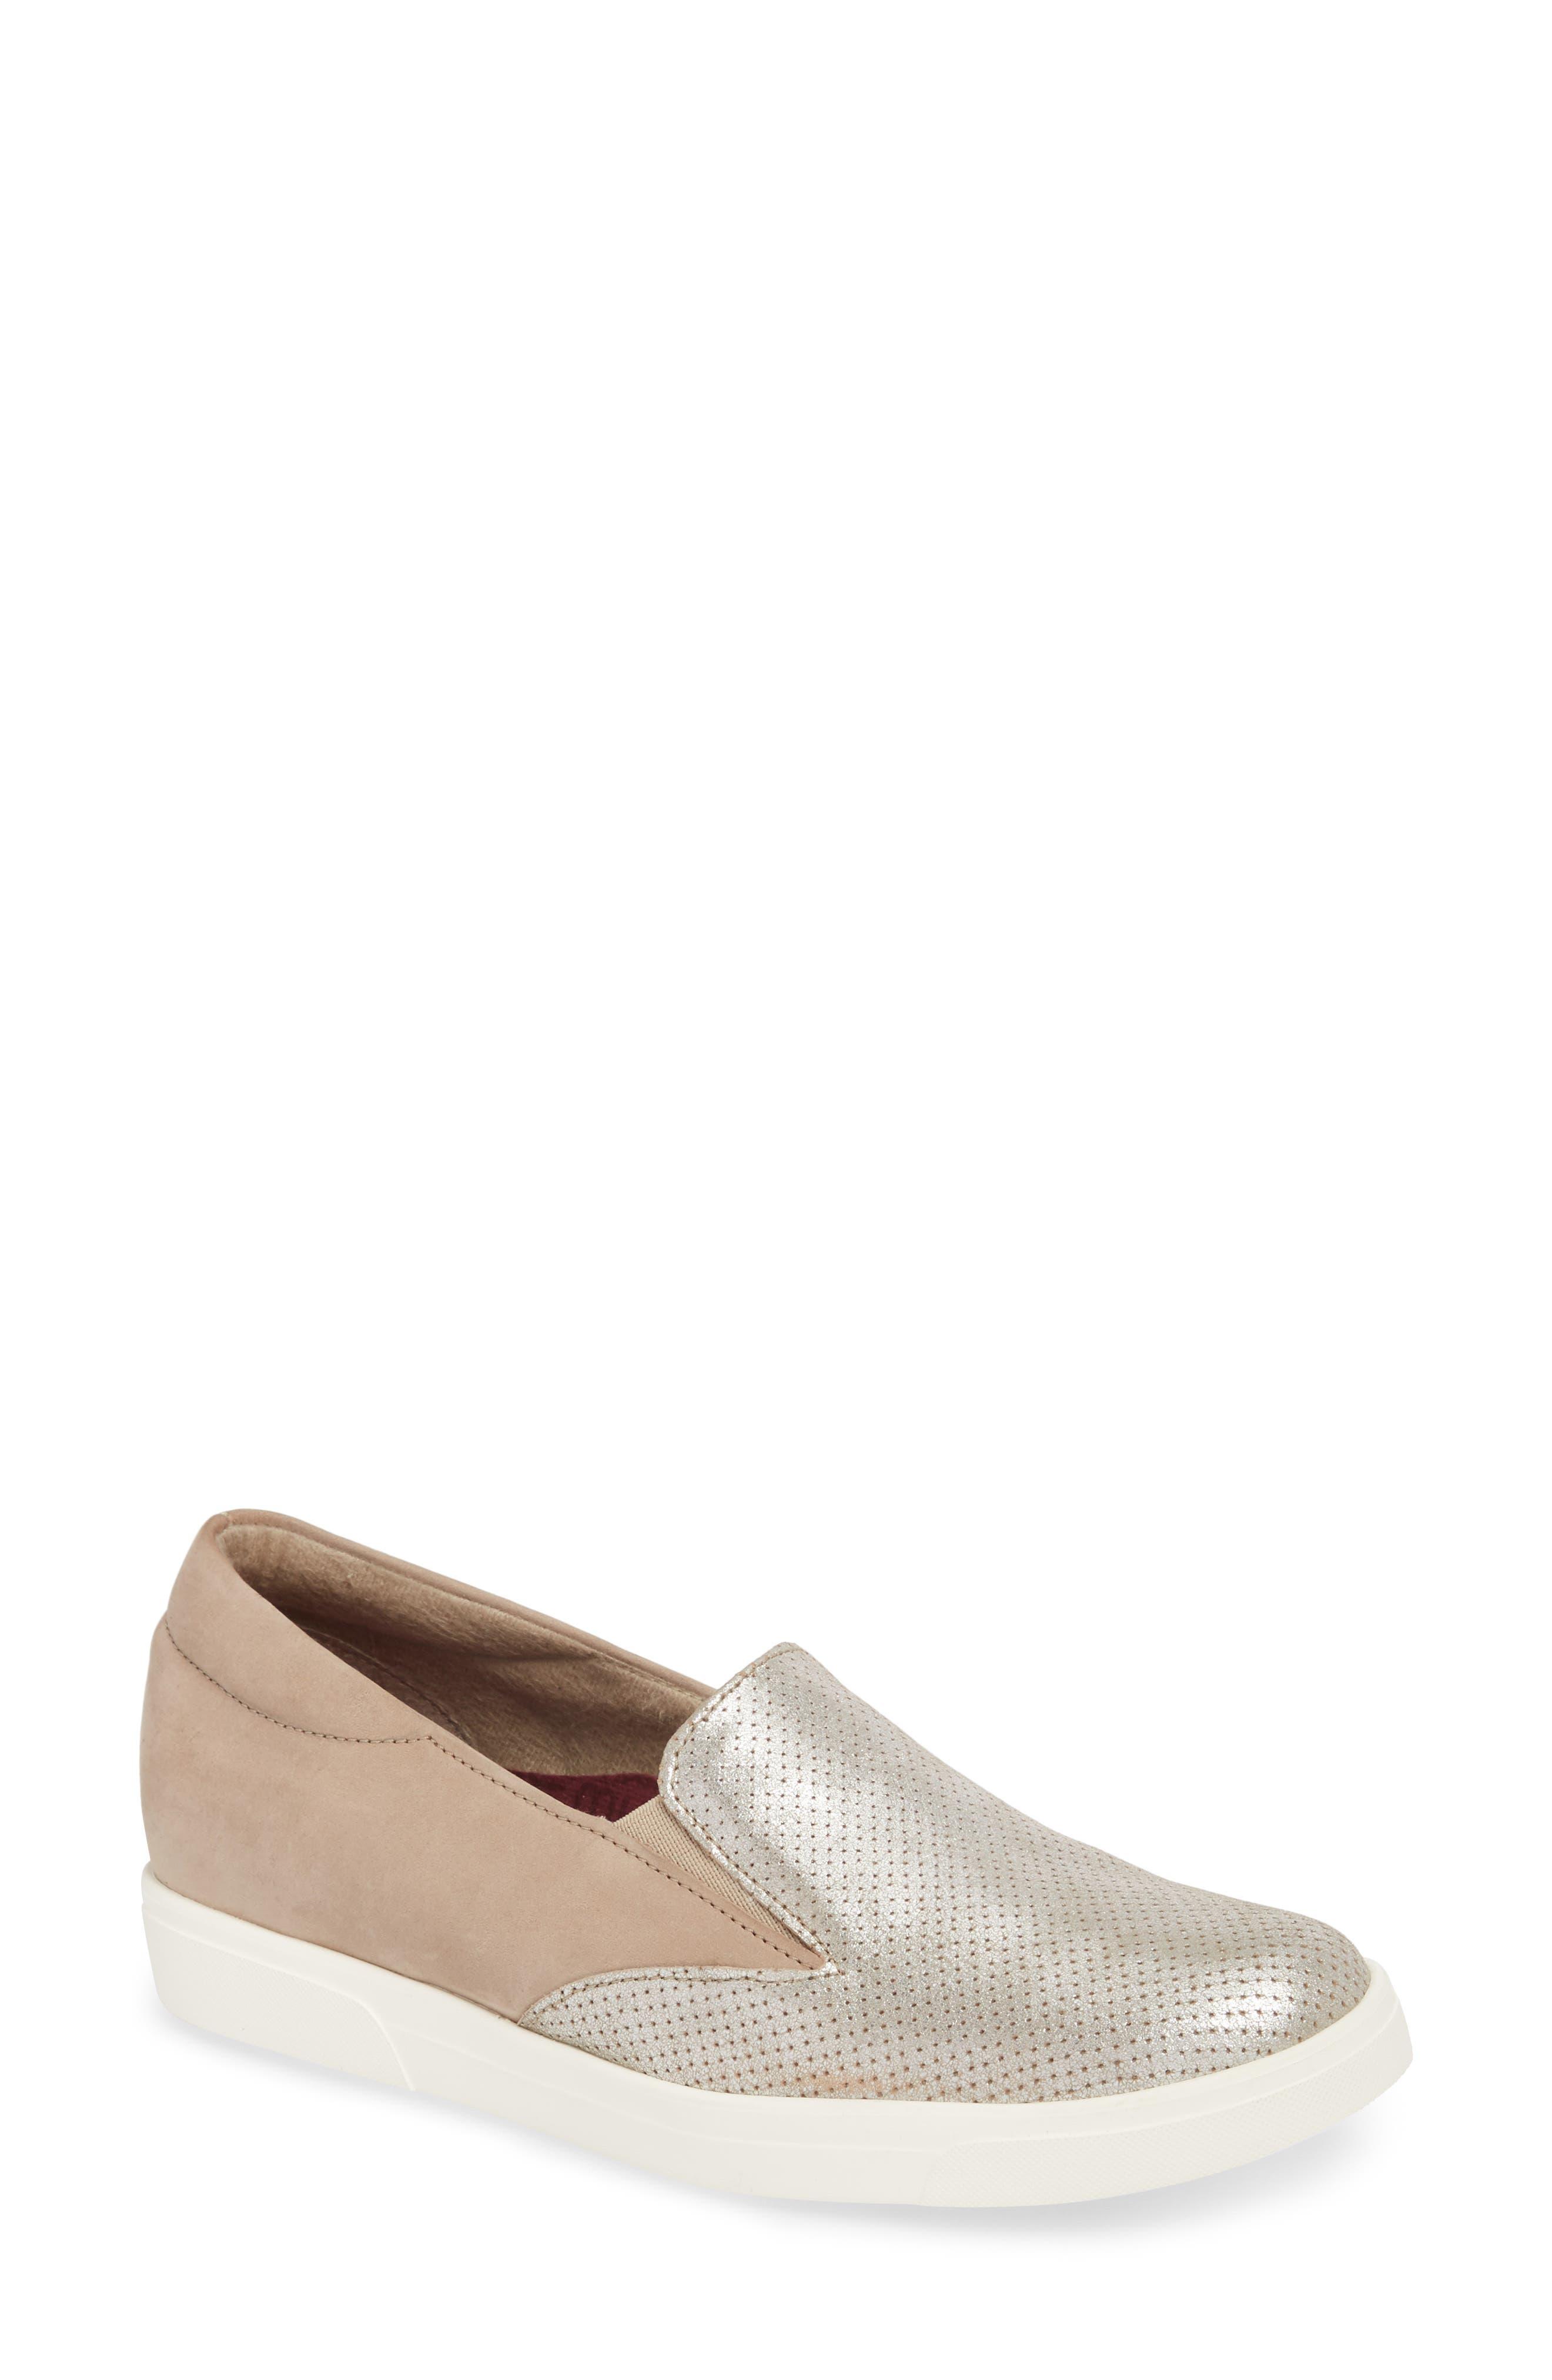 Lulu Slip-On Sneaker,                             Main thumbnail 1, color,                             Brushed Silver Nubuck